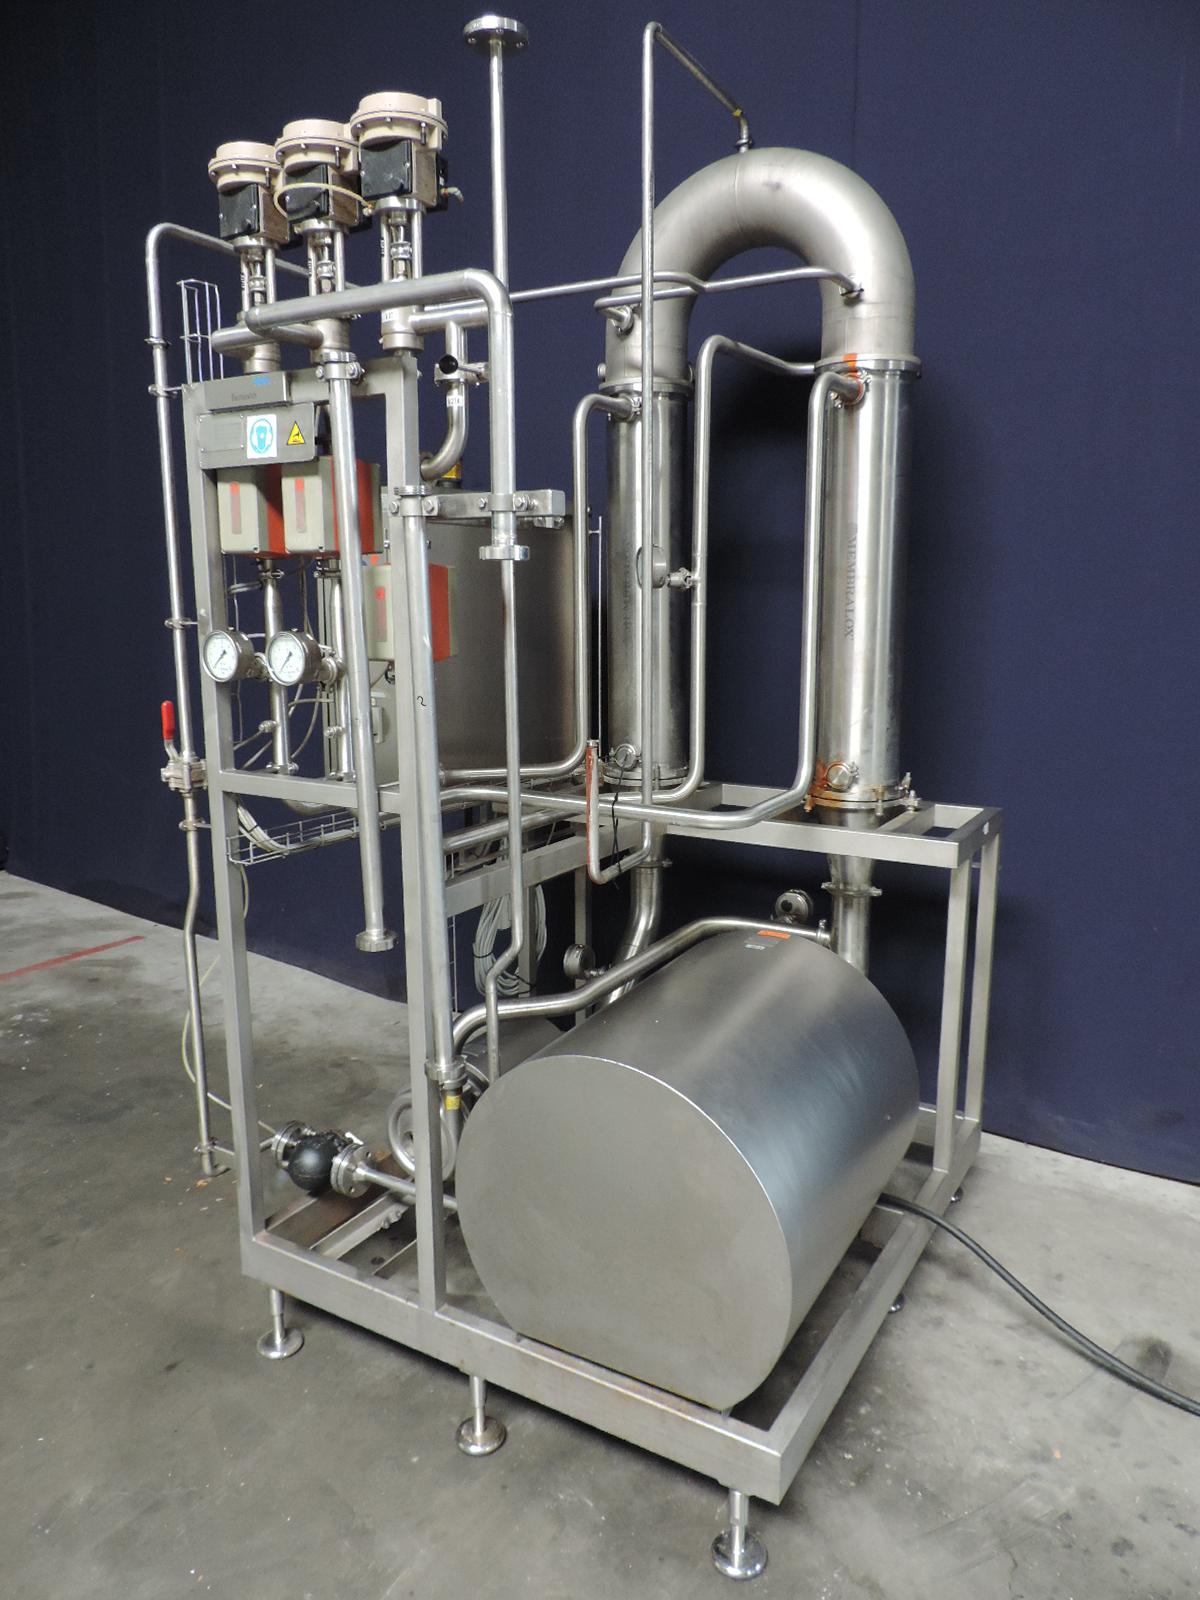 Tetra Pak Alcross M 1x38 Pilot Ultra filtration units